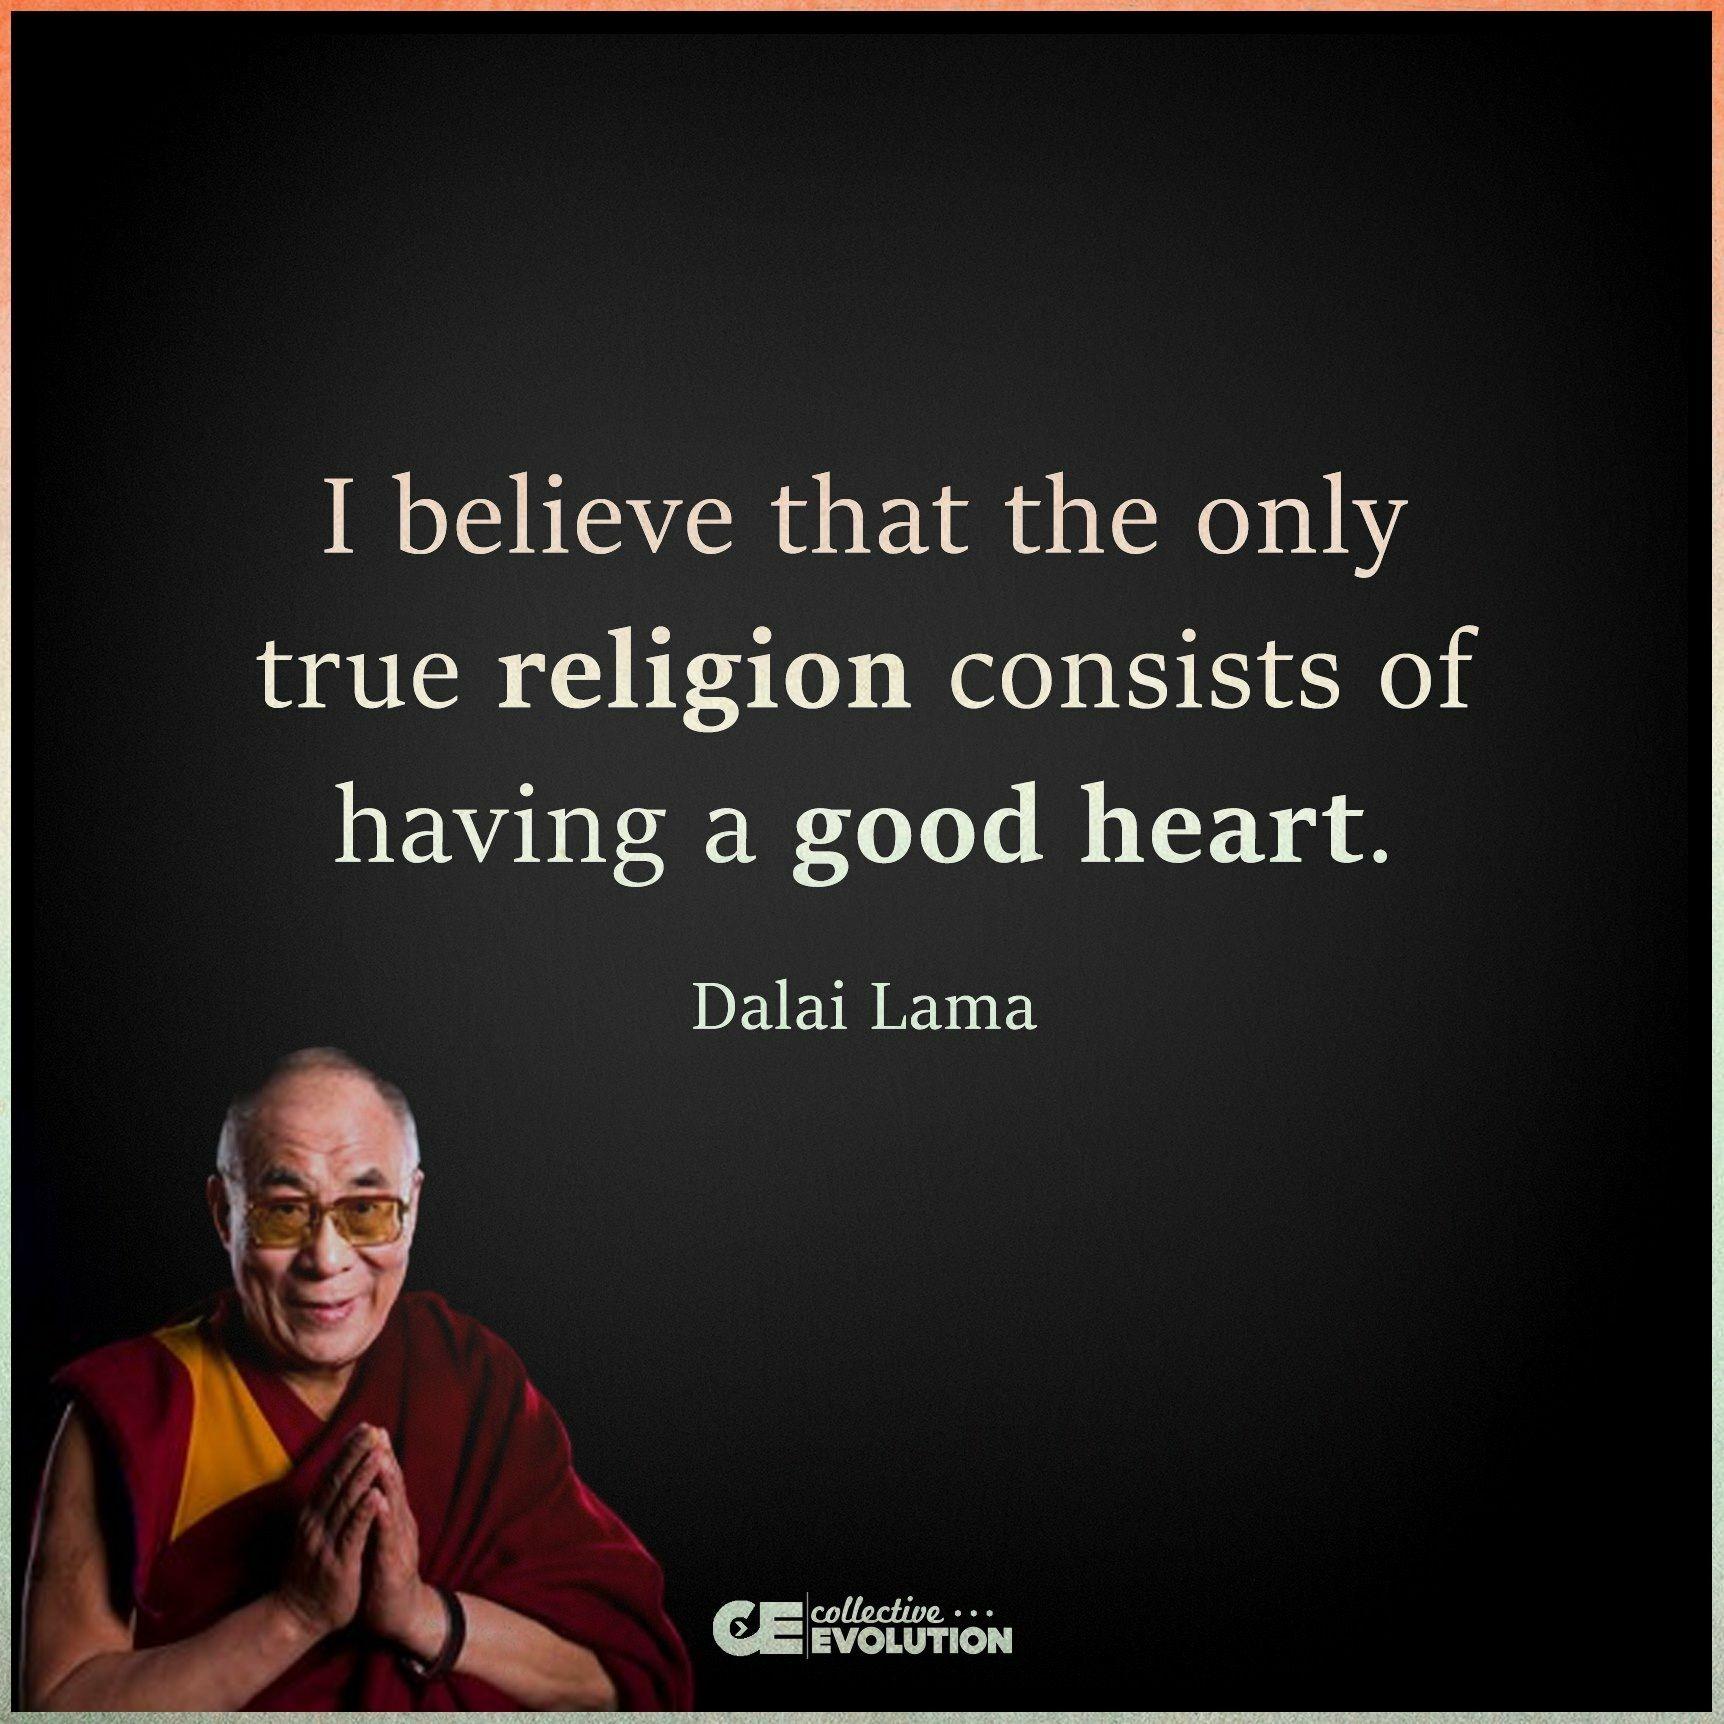 Dalai Lama Quotes On Joy